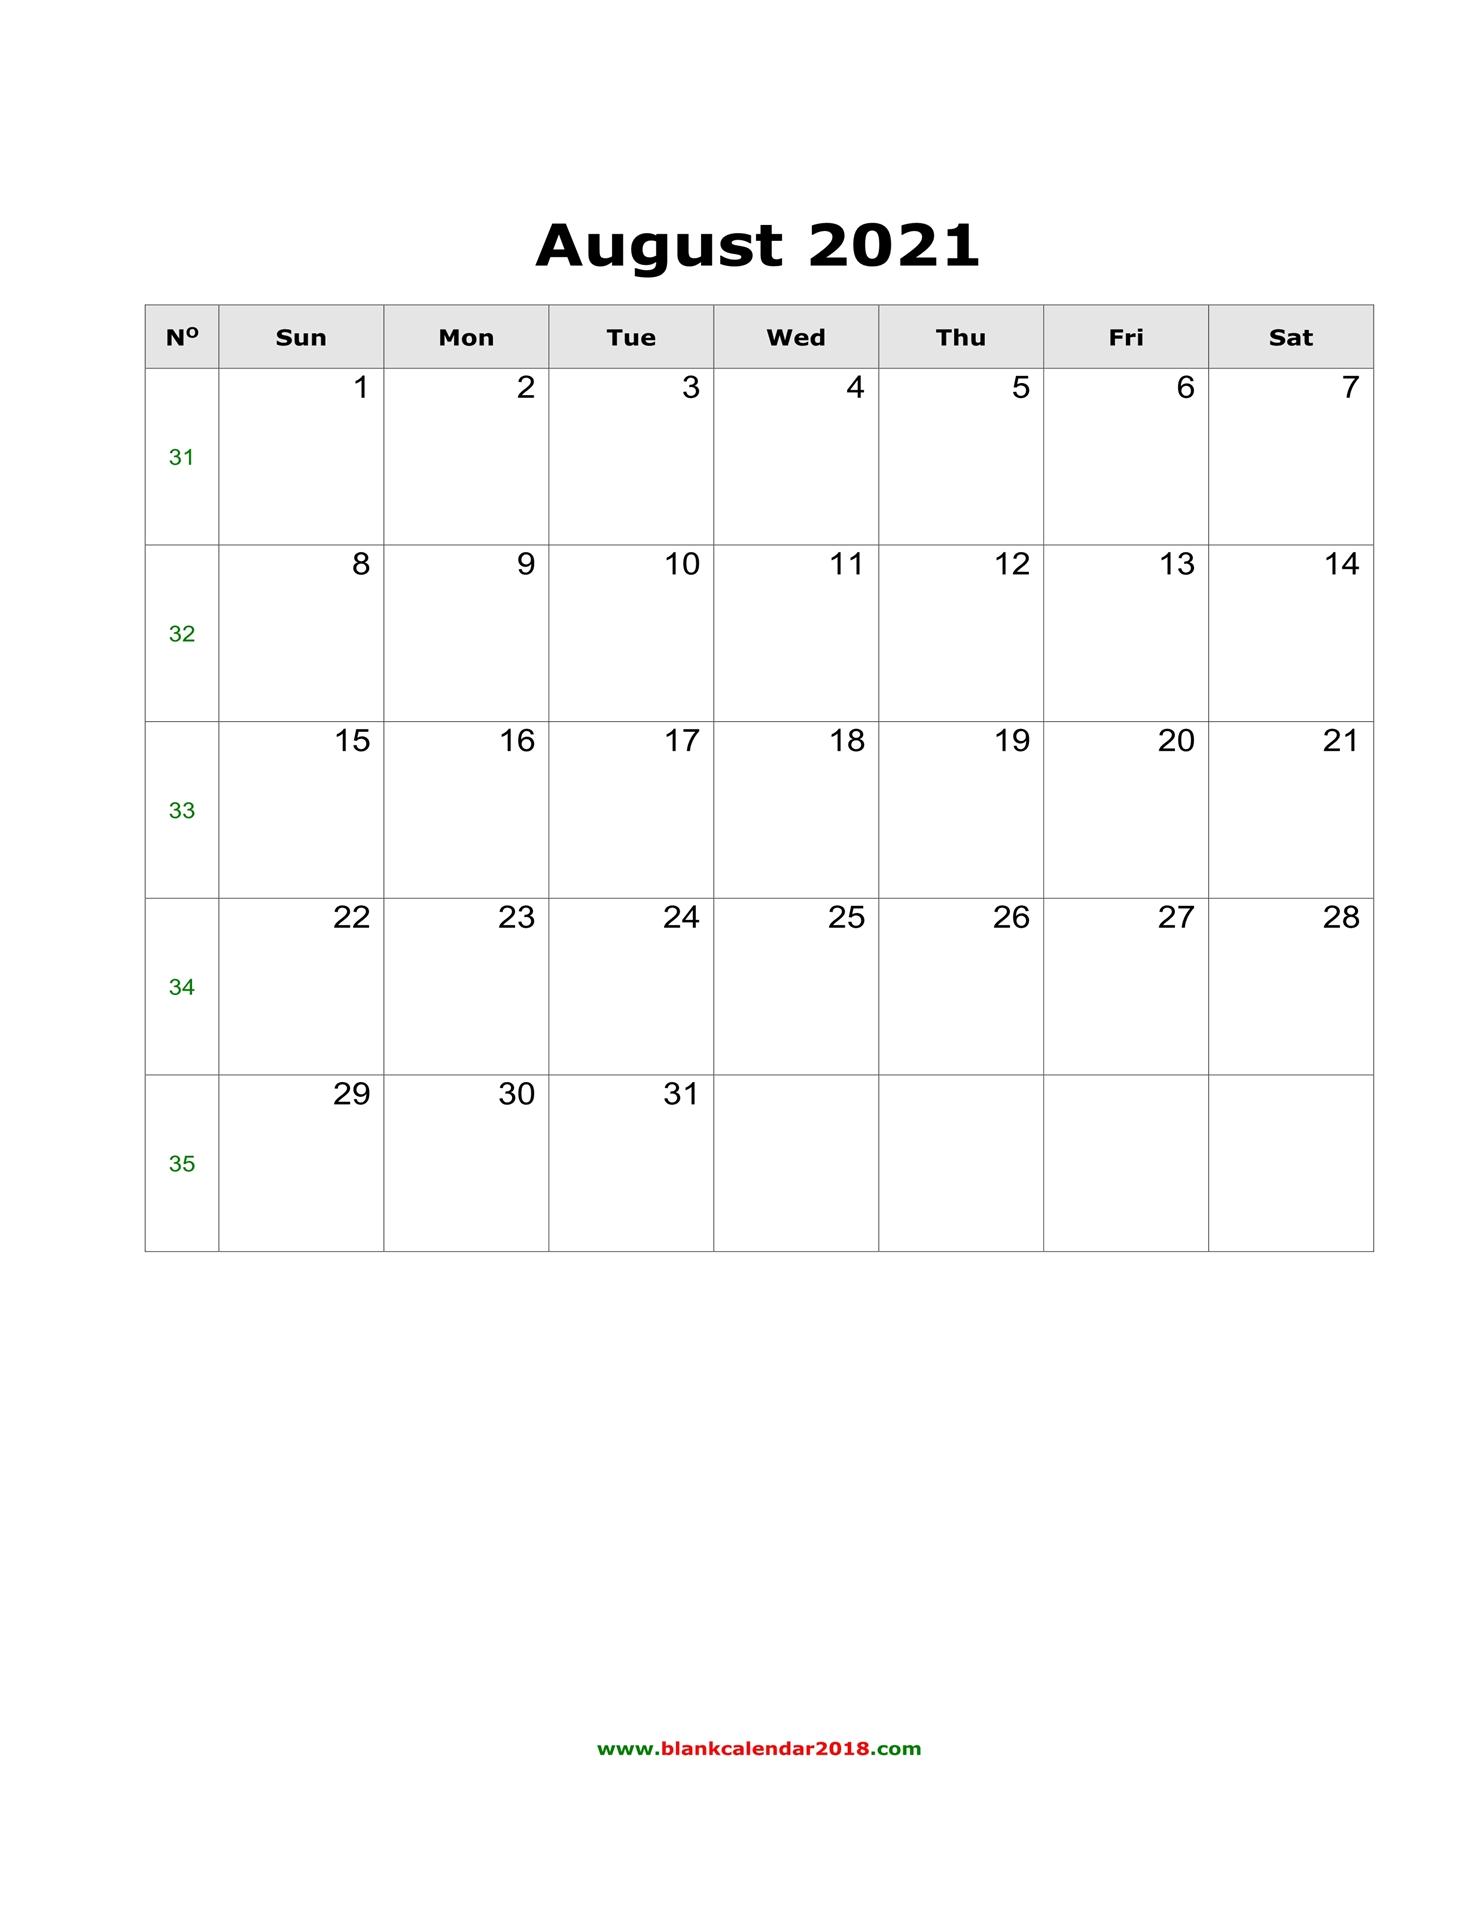 Blank Calendar For August 2021 inside Free Calendars 2021 Word Doc Printable August